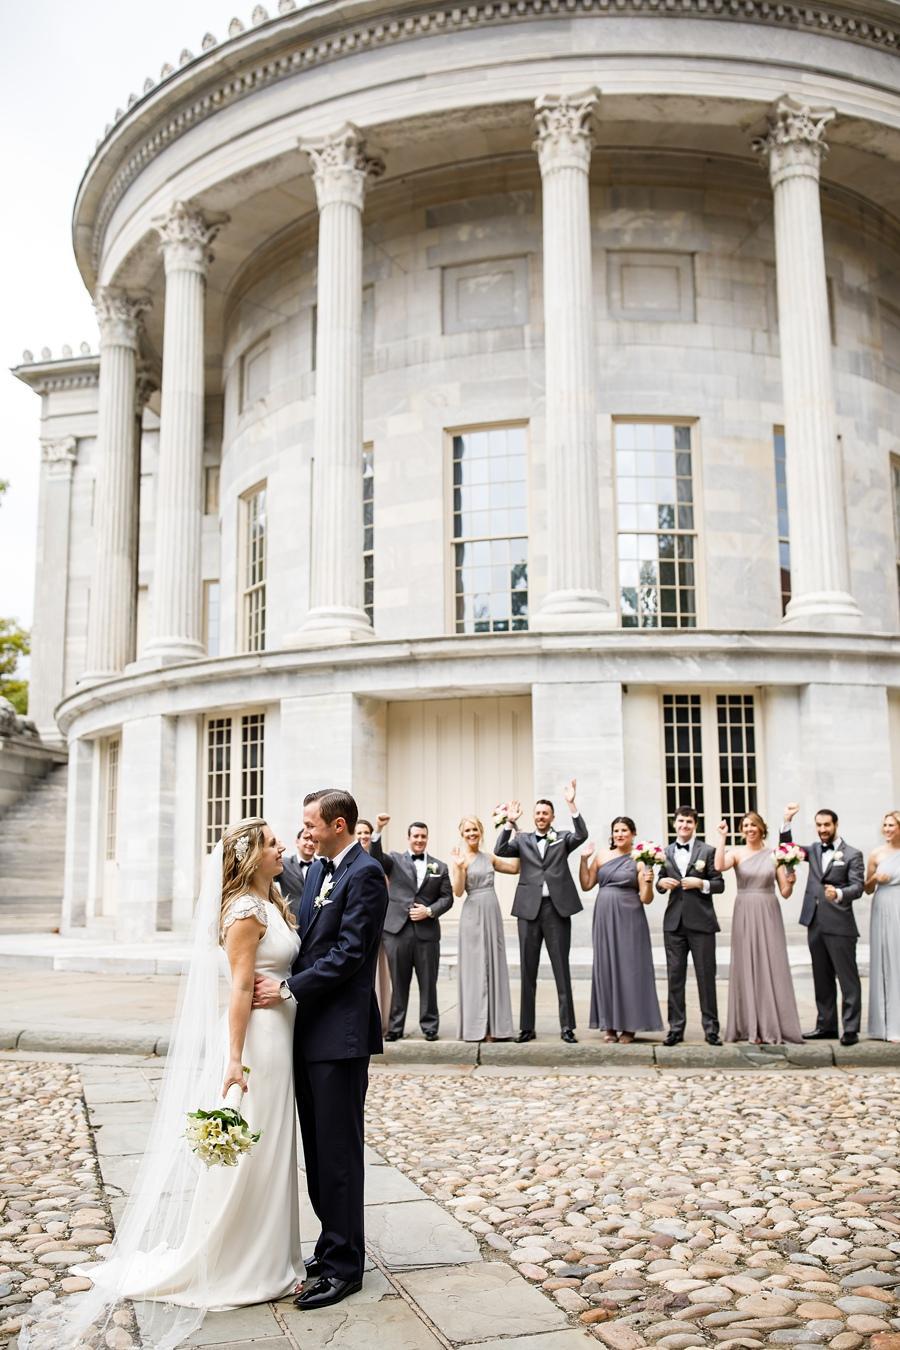 Classic Philadelphia Wedding at Union Trust Anastasia Romanova Photography Philly In Love Philadelphia Weddings Venues Vendors